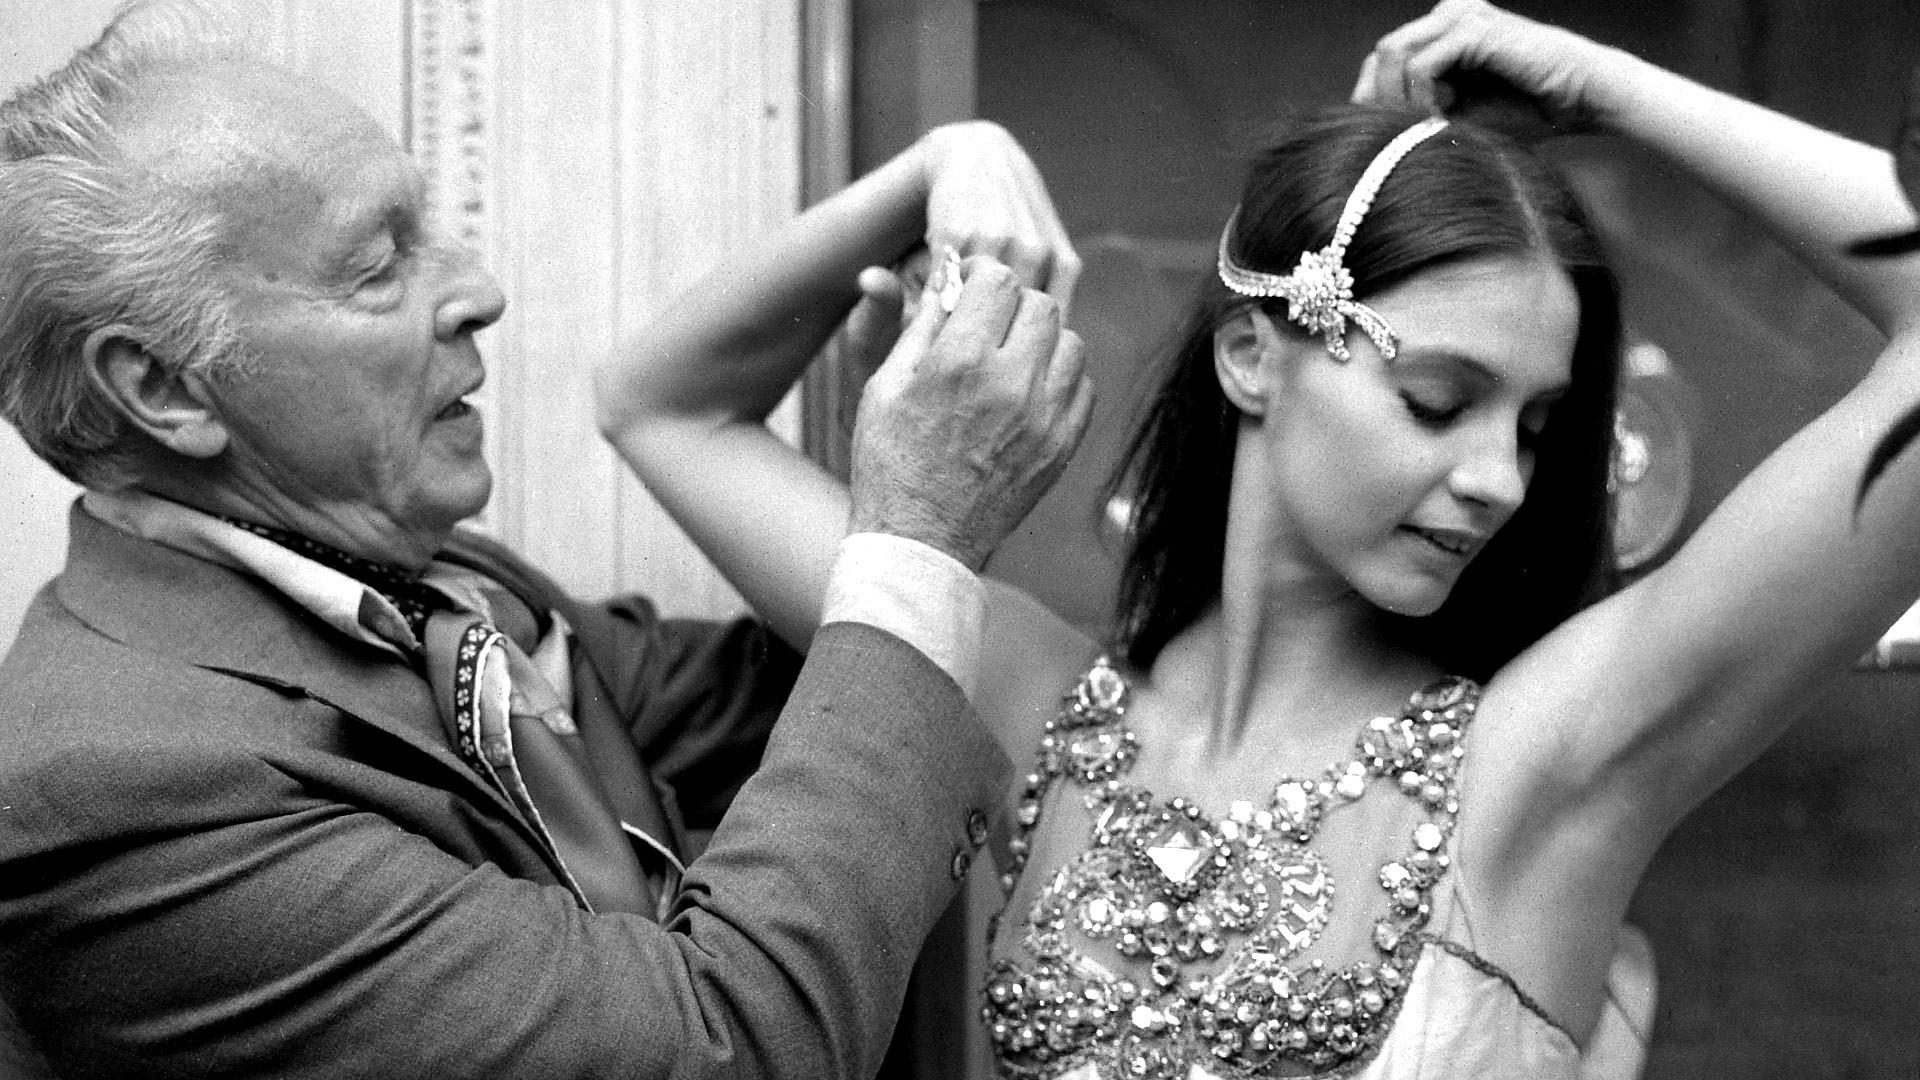 George Balanchine i plesačica Suzanne Farrell koja nosi nakit 'Van Cleef & Arpels' za balet Balanchinea